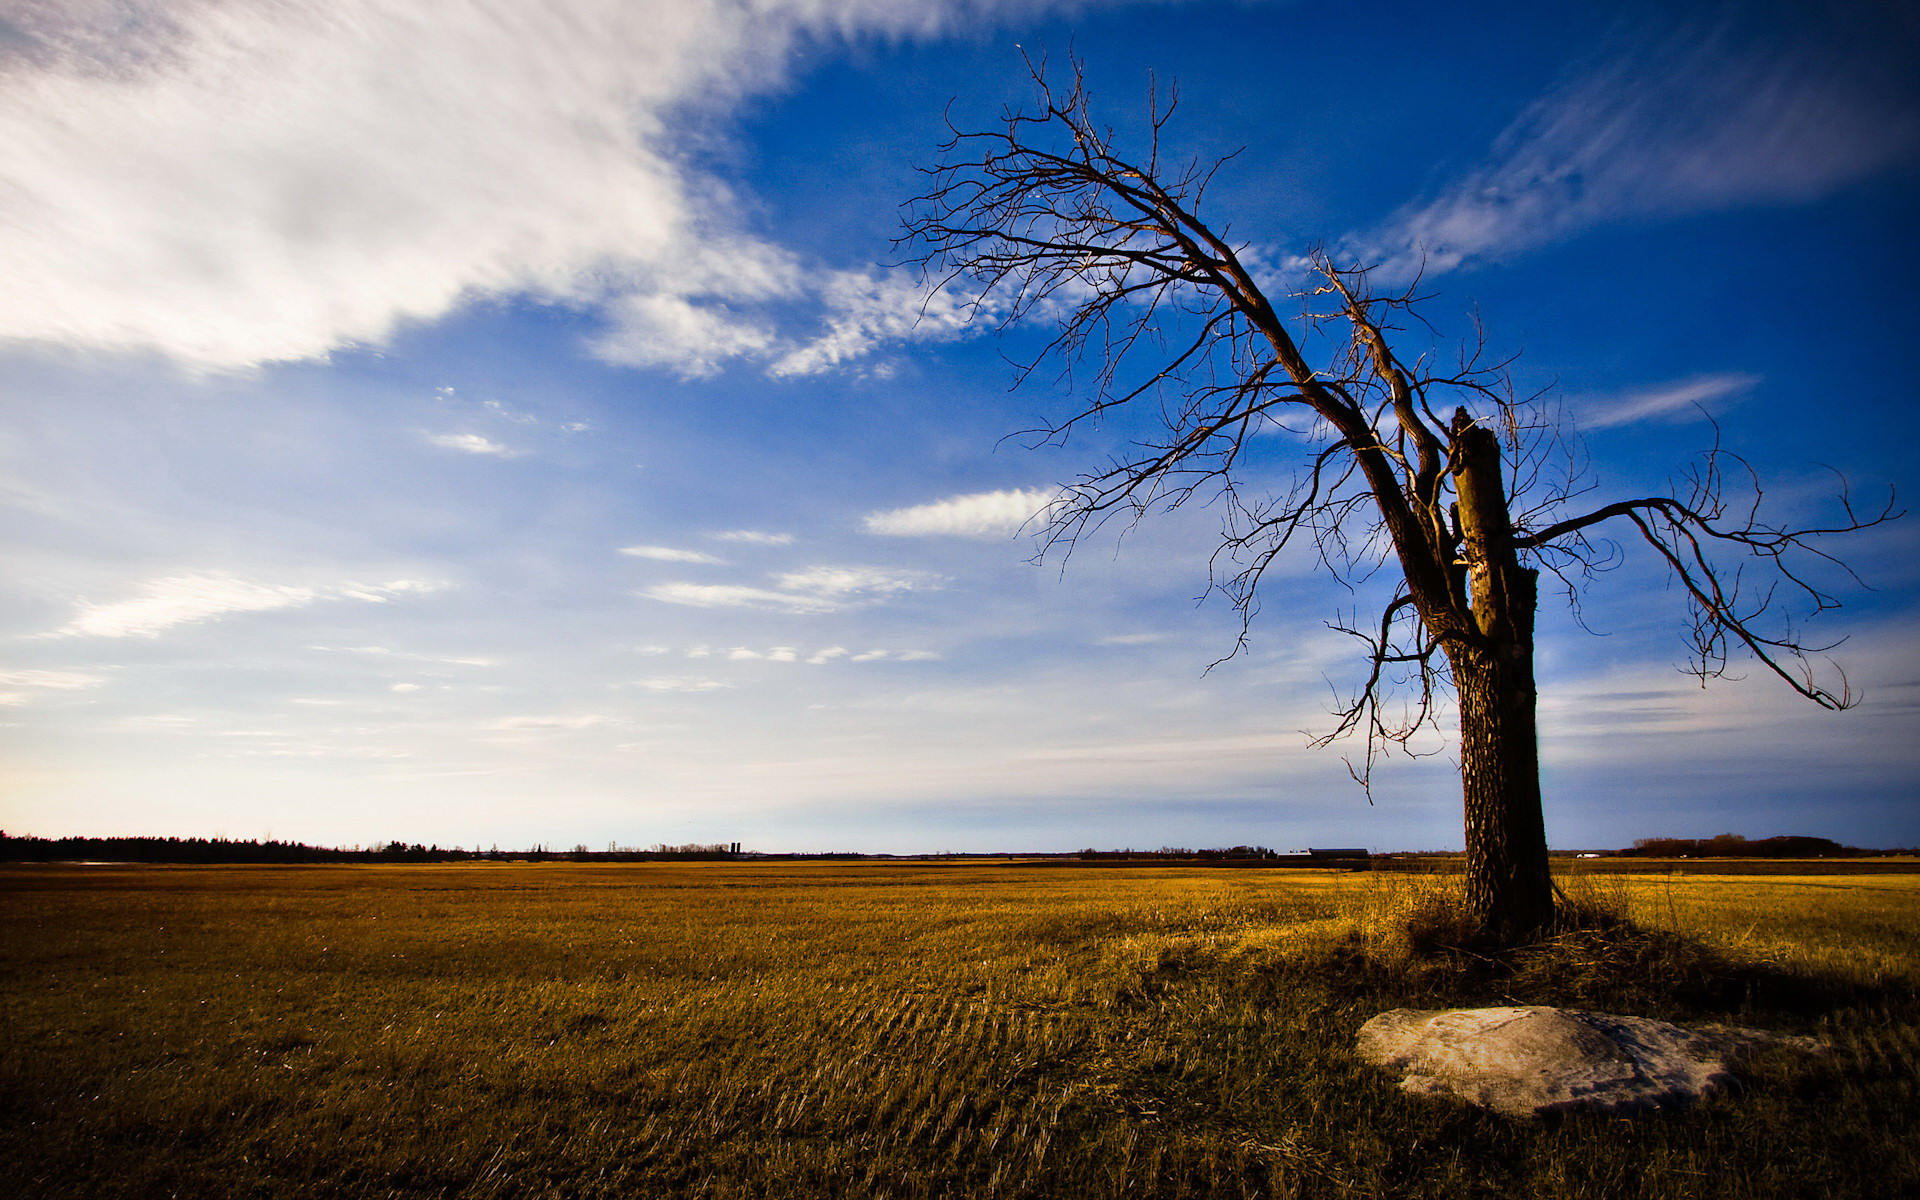 Broken lonely tree / 1920 x 1200 / Nature / Photography | MIRIADNA.COM